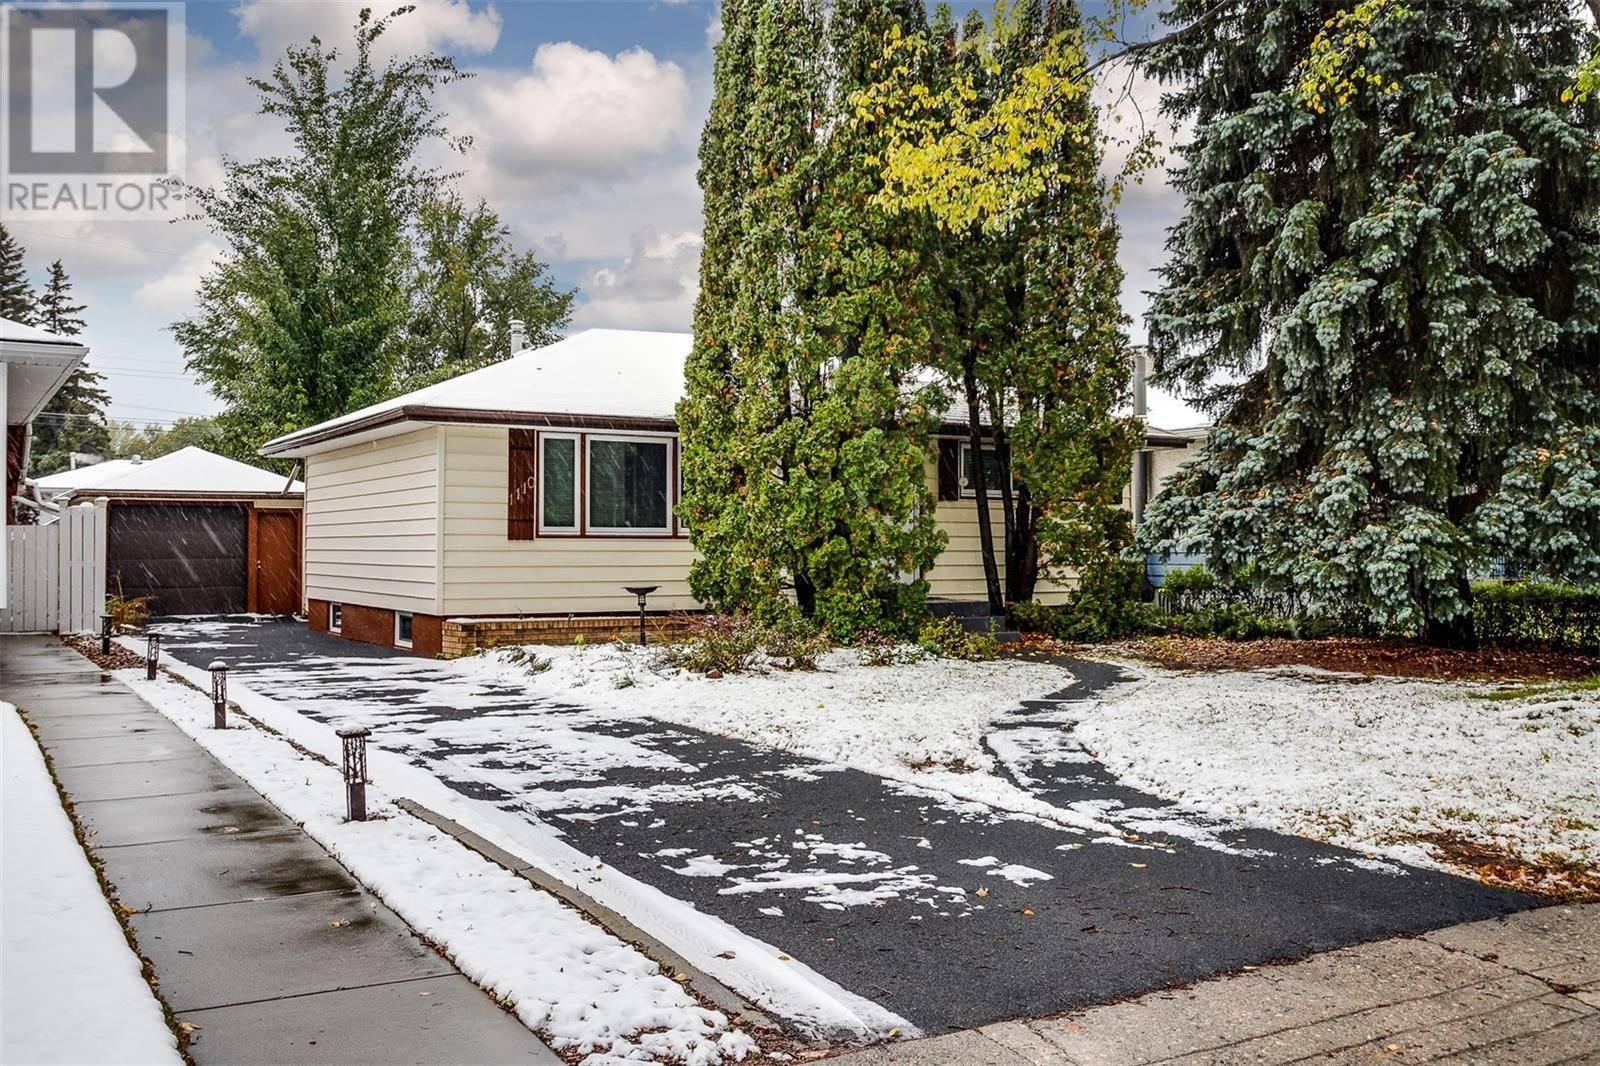 House for sale at 1110 1st St E Saskatoon Saskatchewan - MLS: SK793329